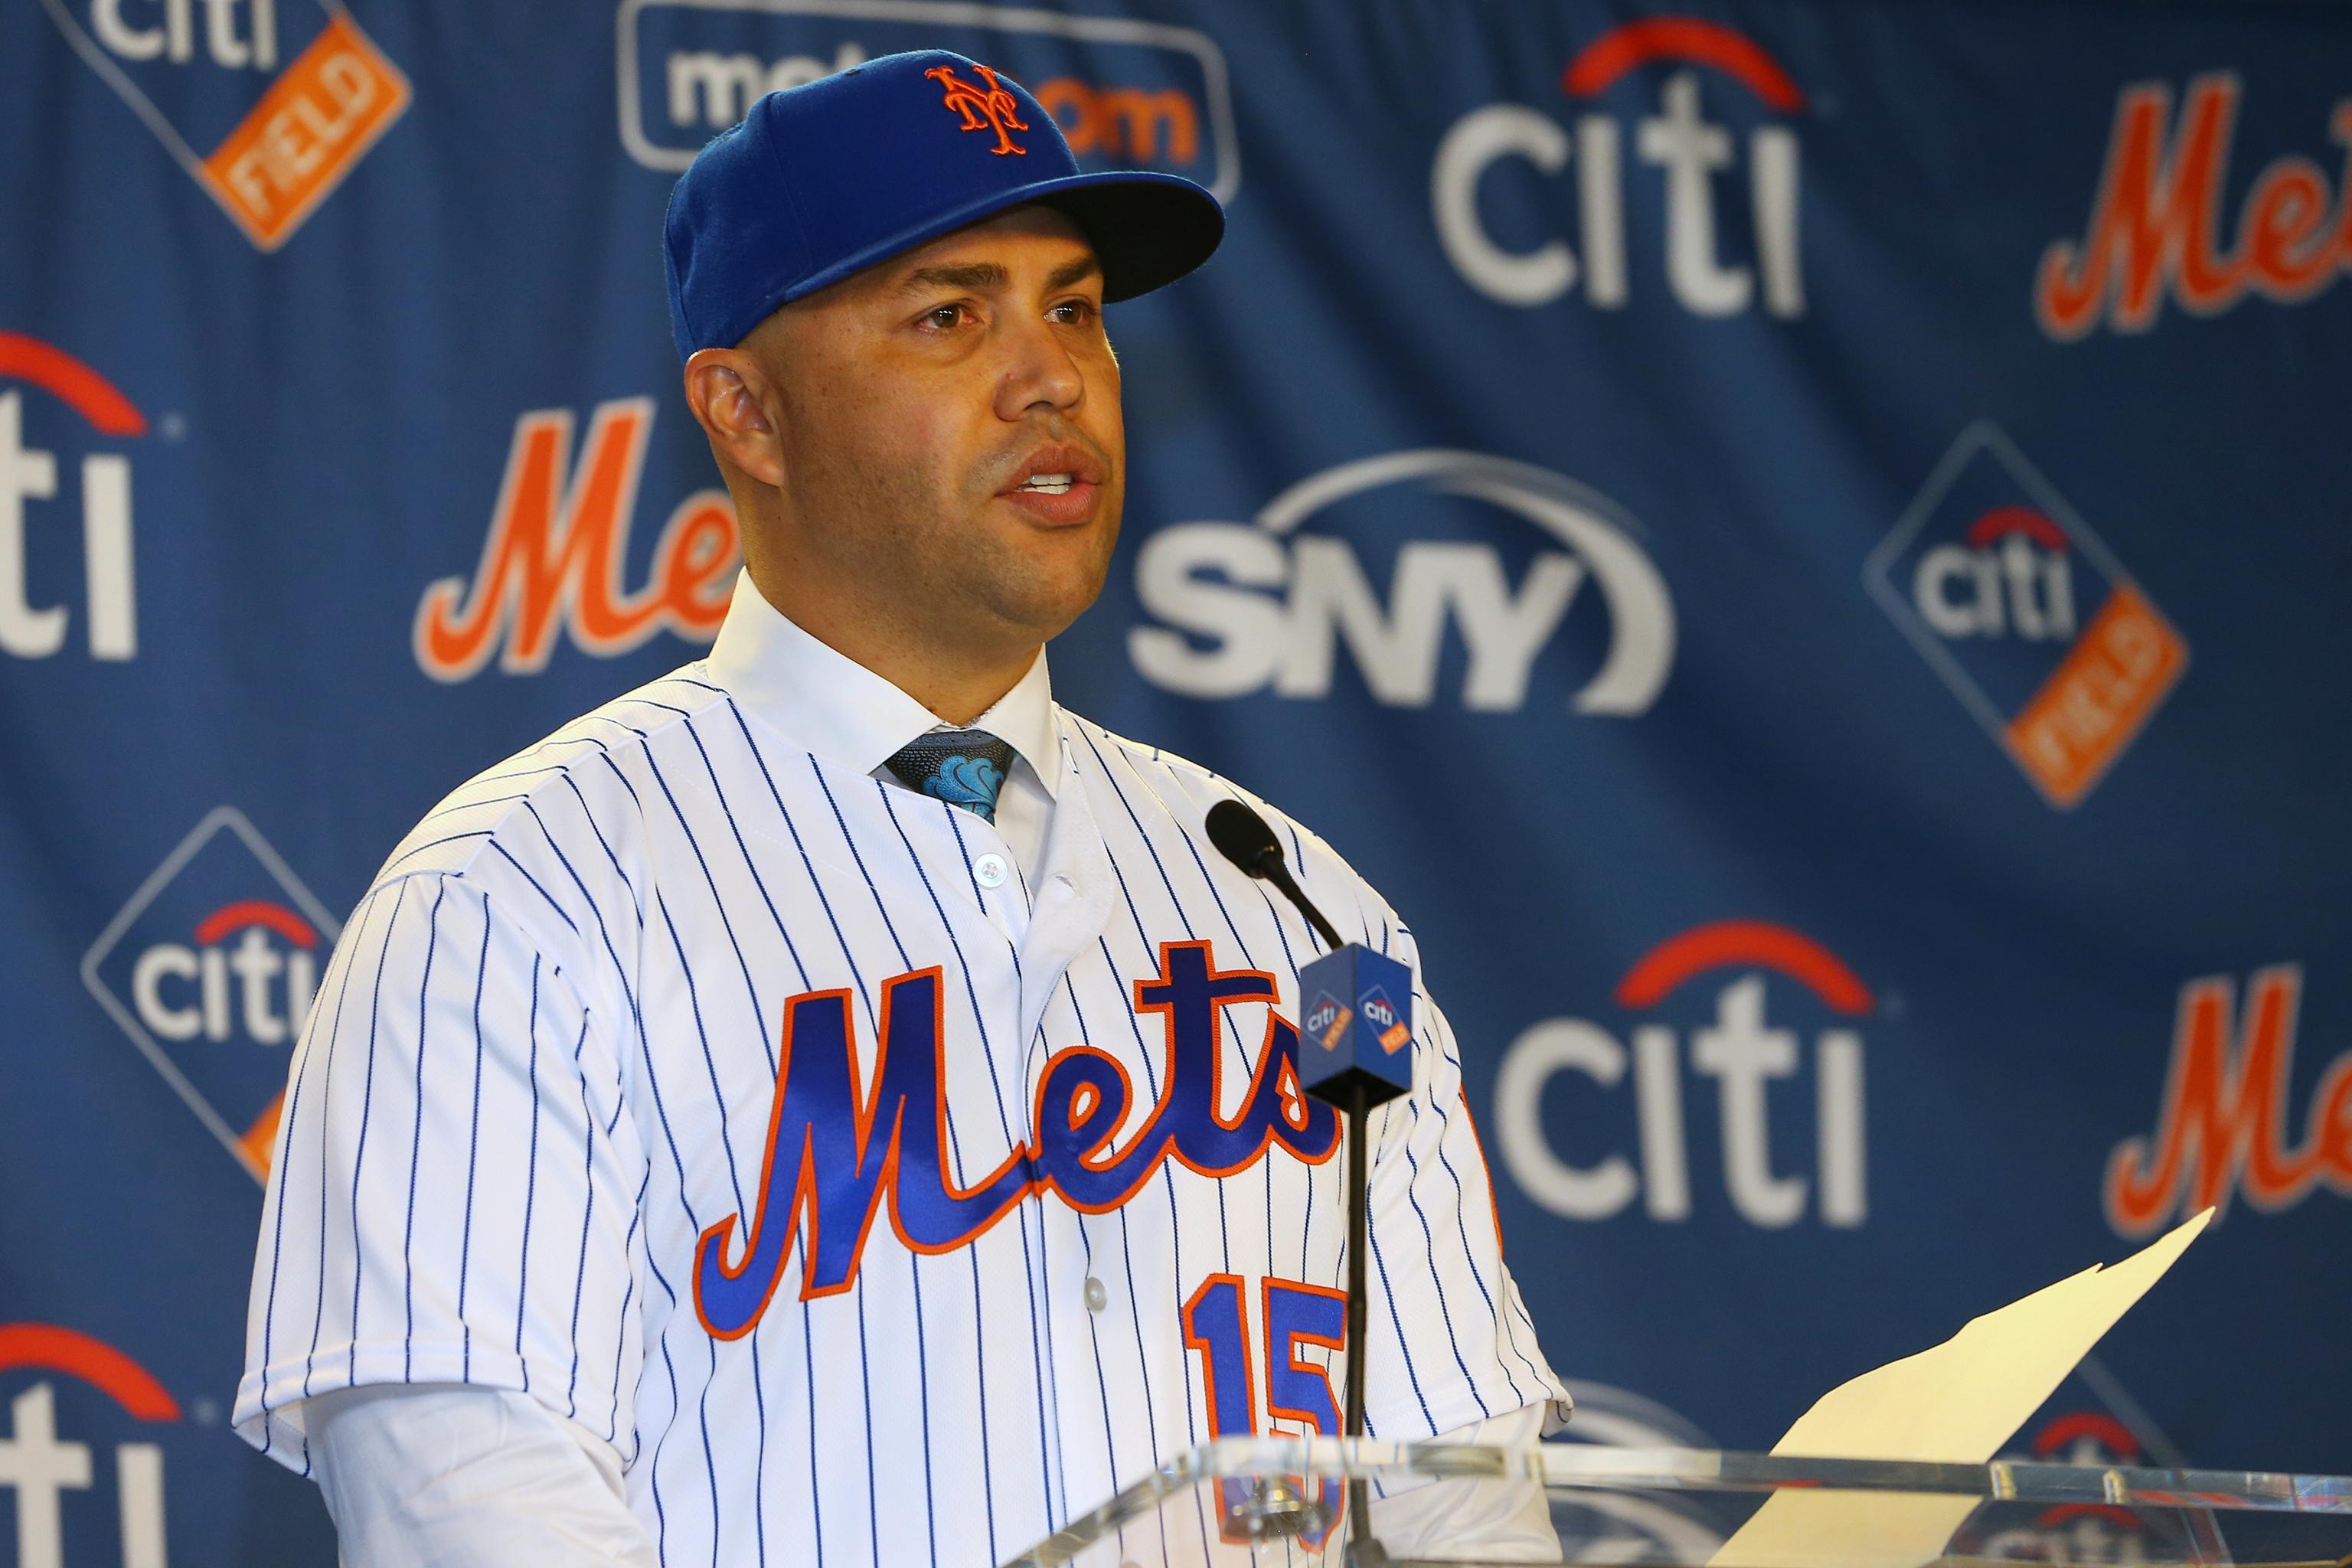 Report Alex Cora Carlos Beltran Linked To Astros Sign